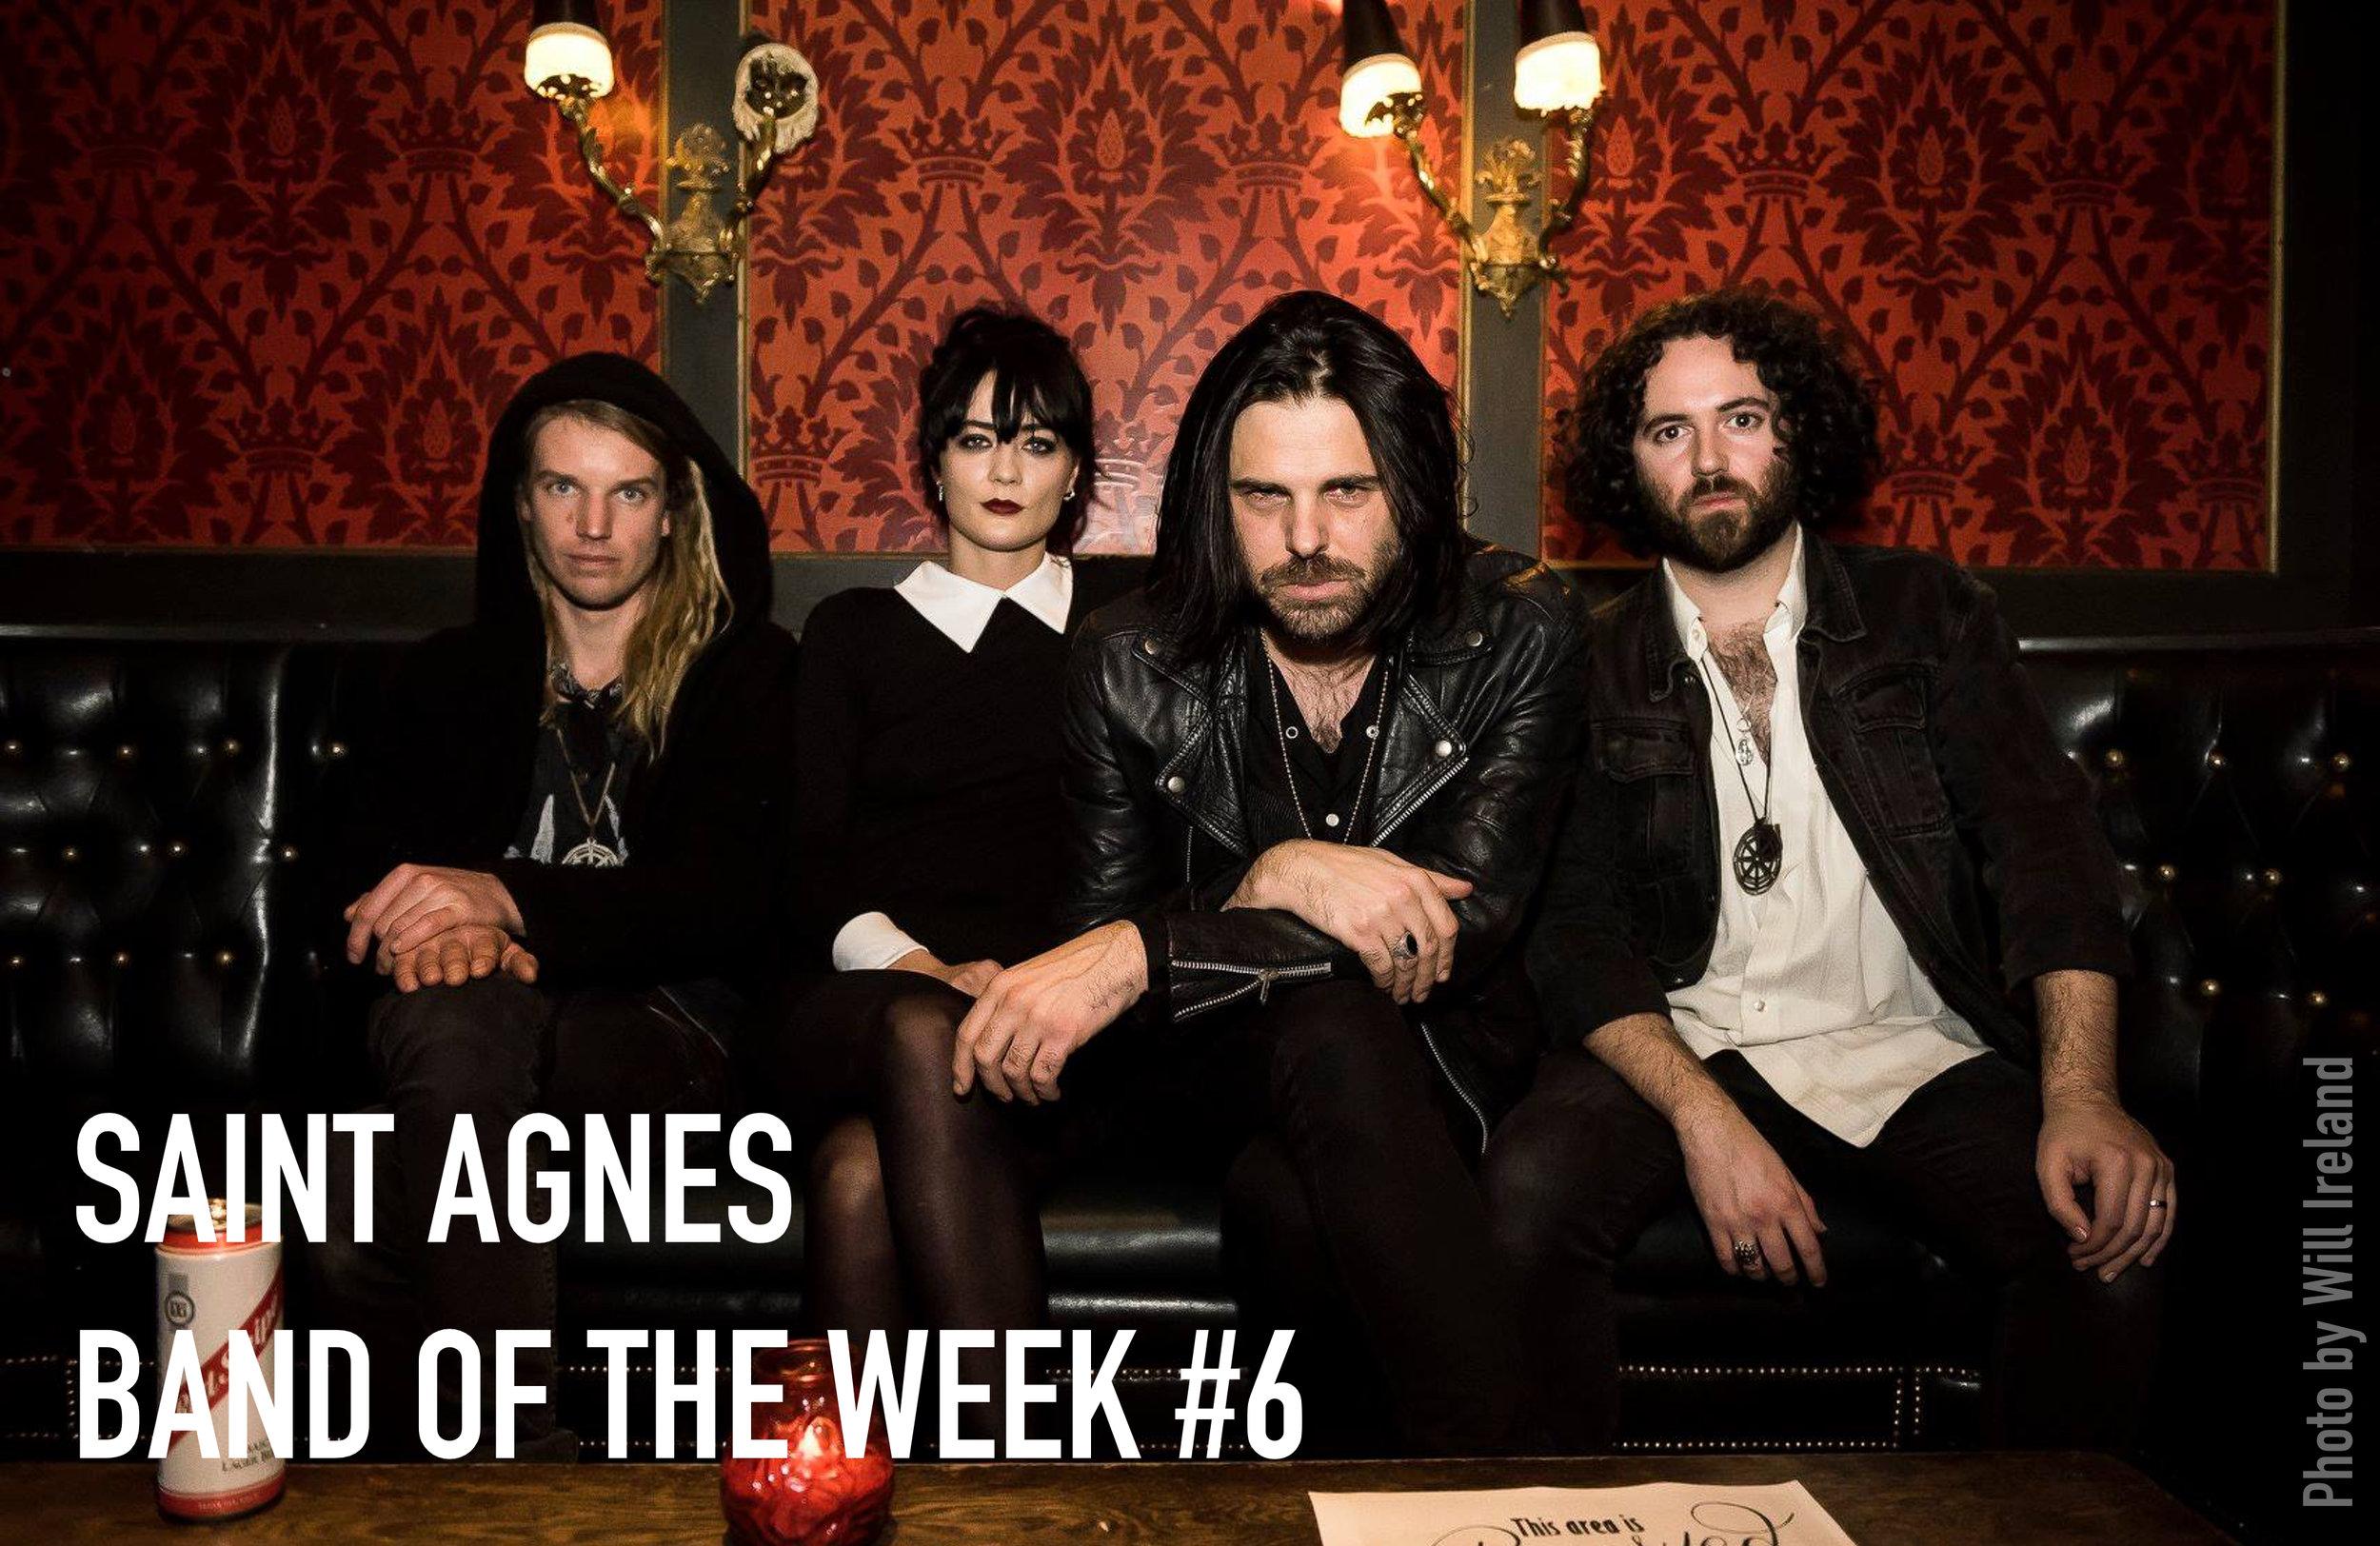 saint agnes band of the week.jpg